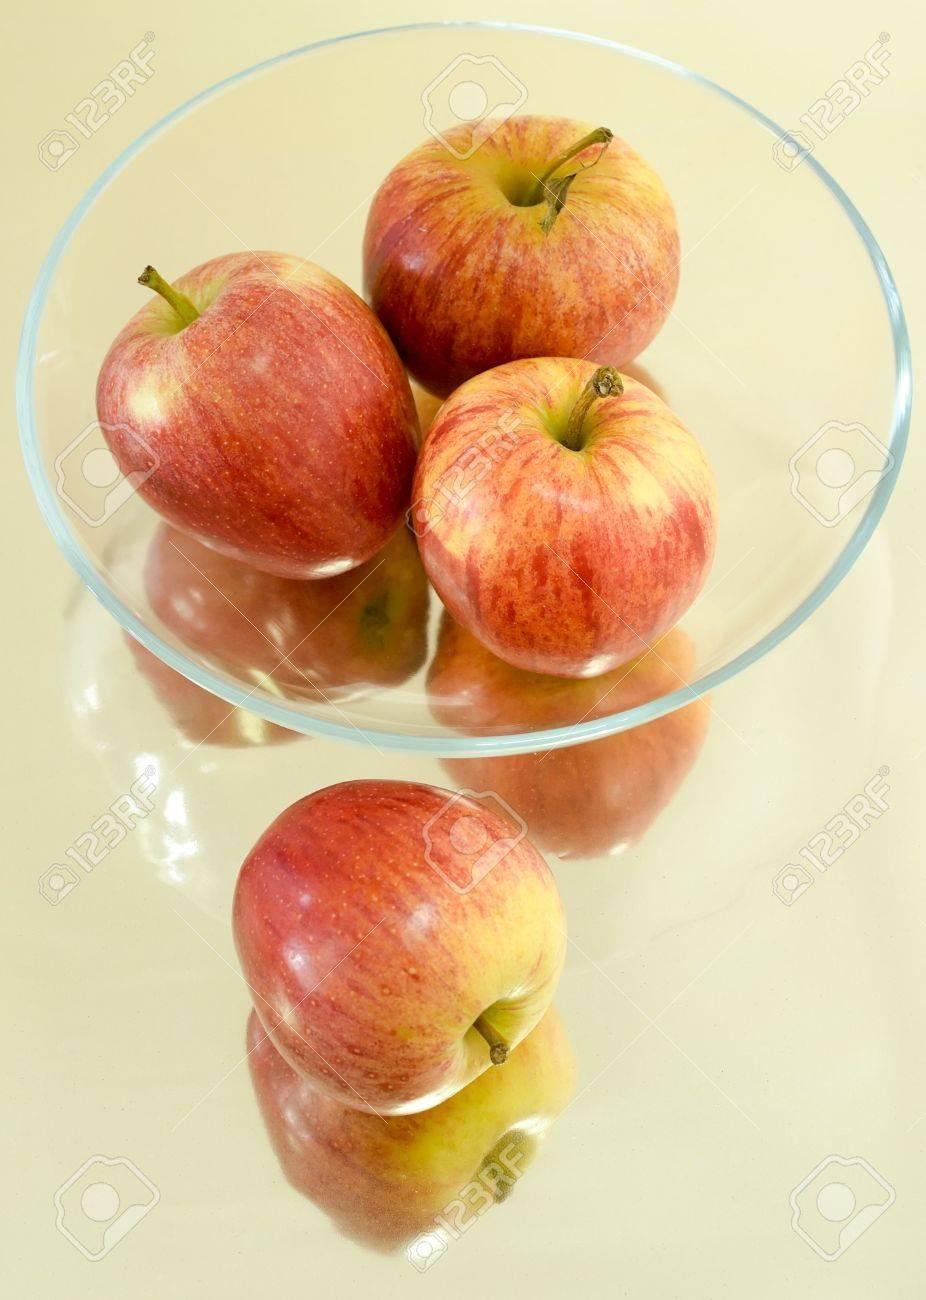 Glasses Apple Apples in Glass Bowl